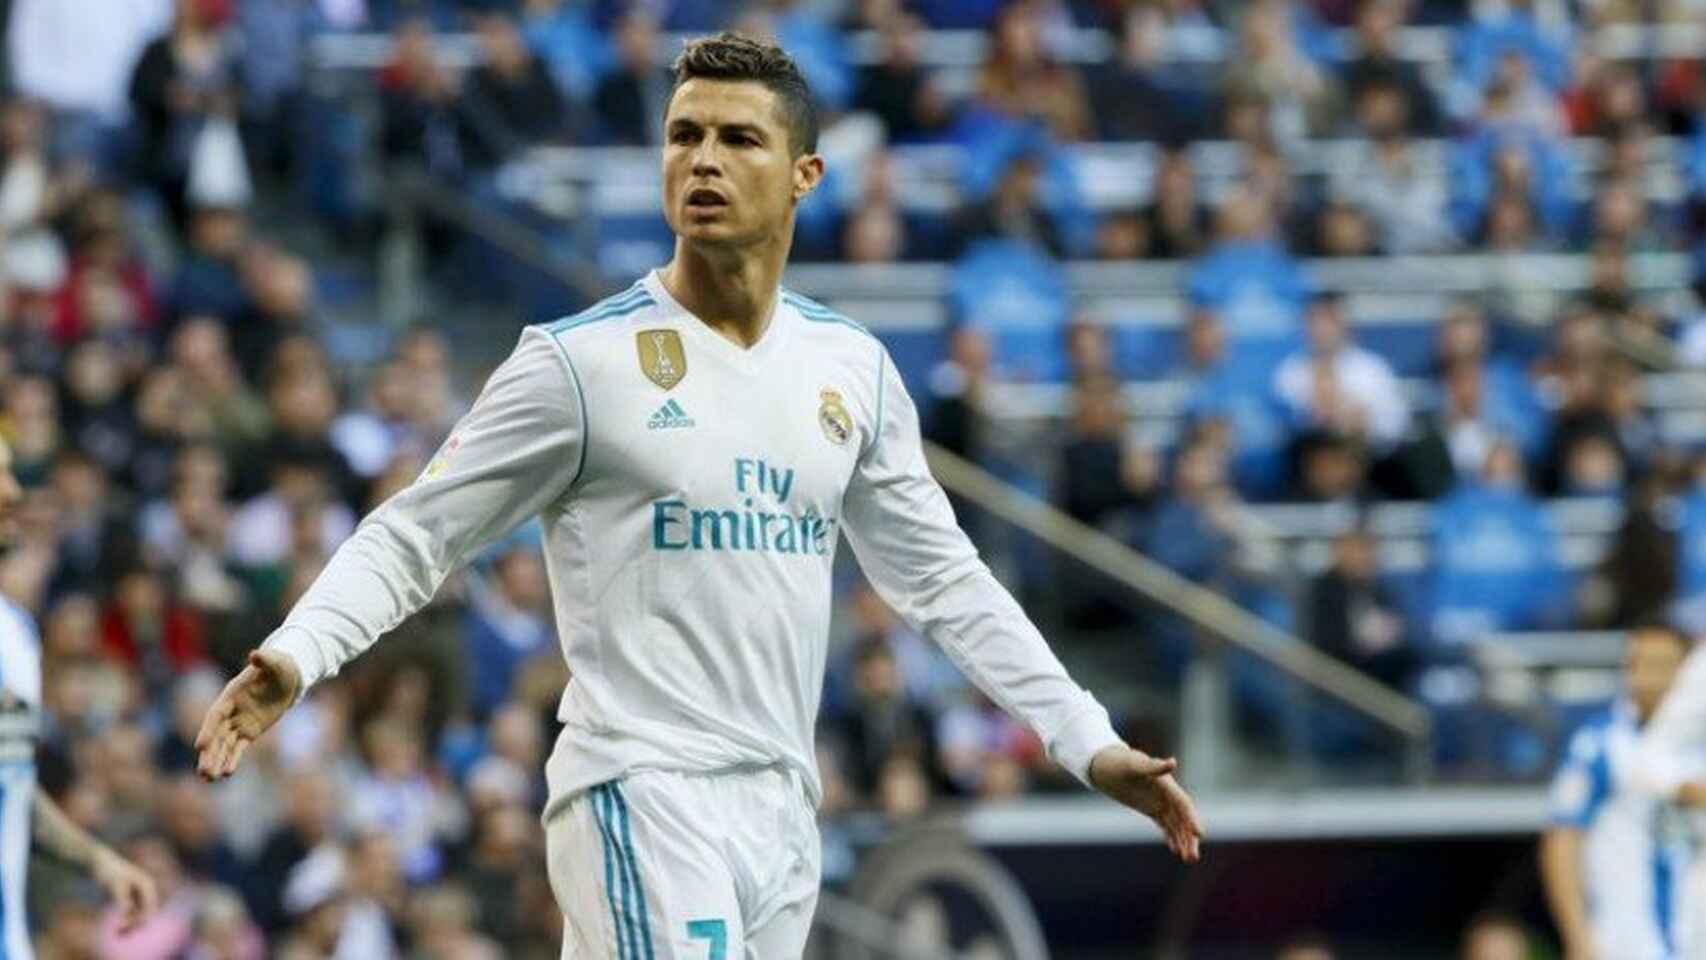 45.-Messi-y-Ronaldo-dos-fichas-devaluadas-Ronaldo.jpg